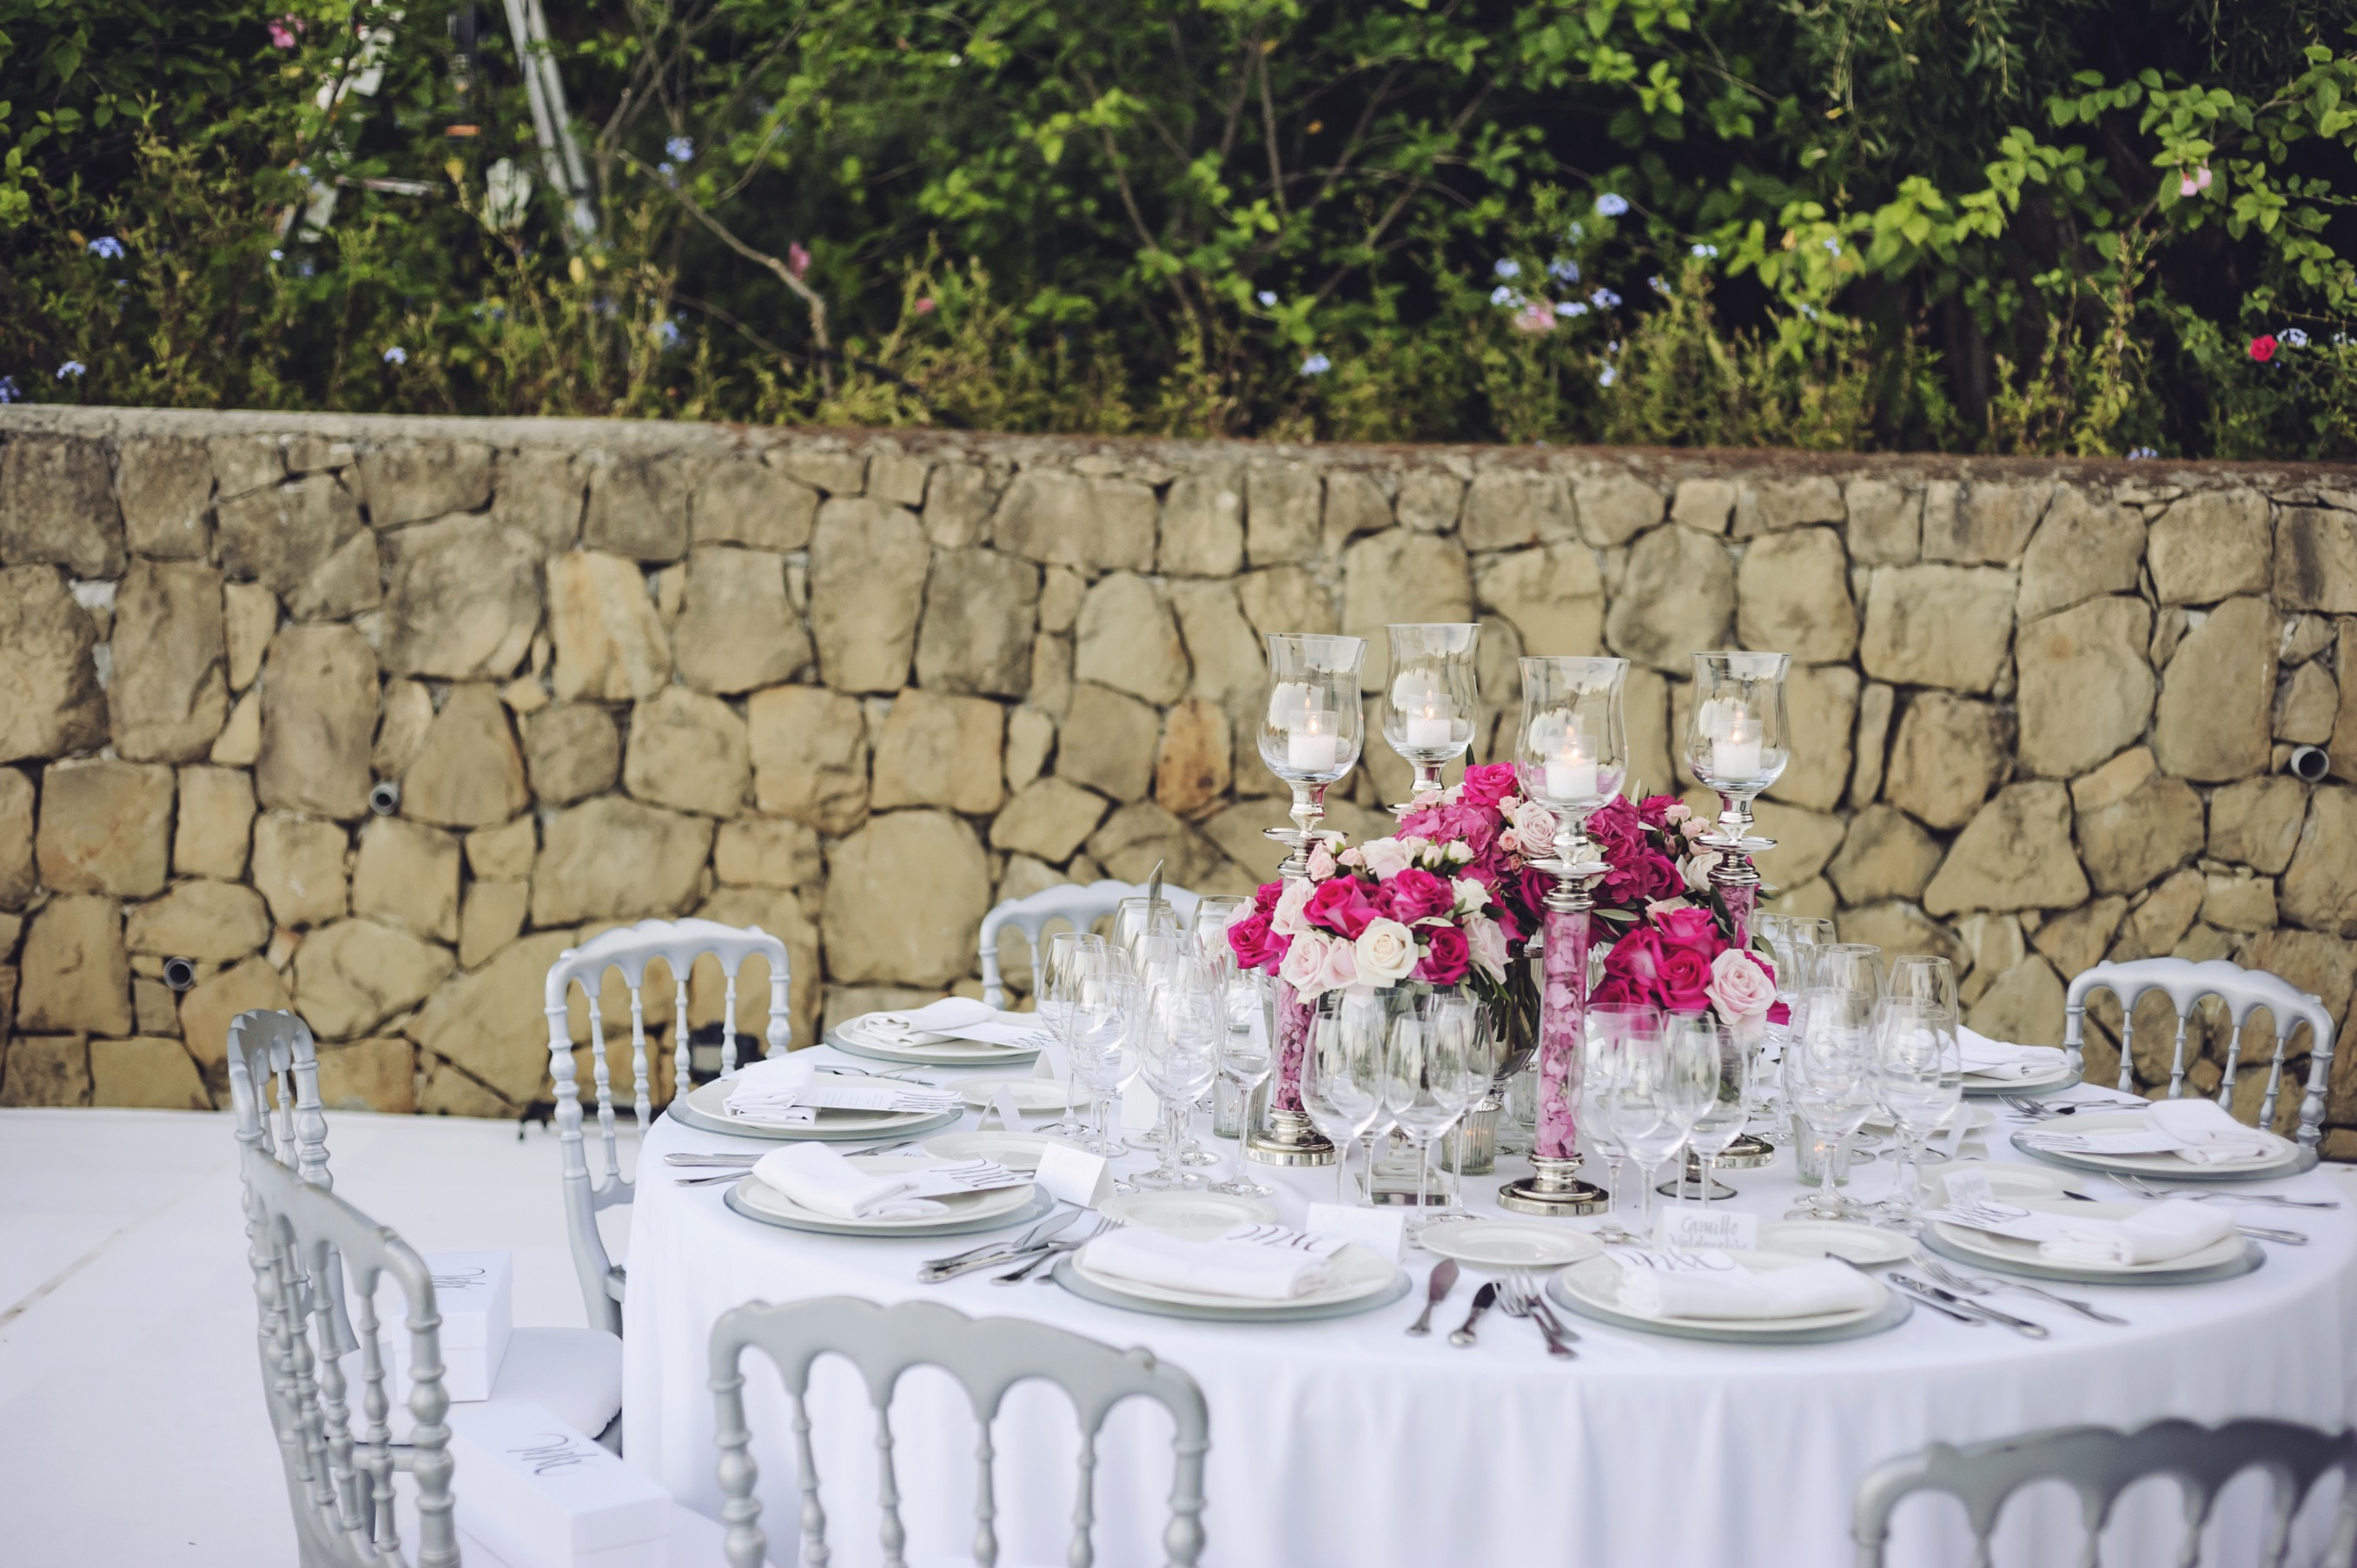 Si-Quiero-Wedding-Planner-By-Sira-Antequera-Bodas-Málaga-Marbella-Miami-9